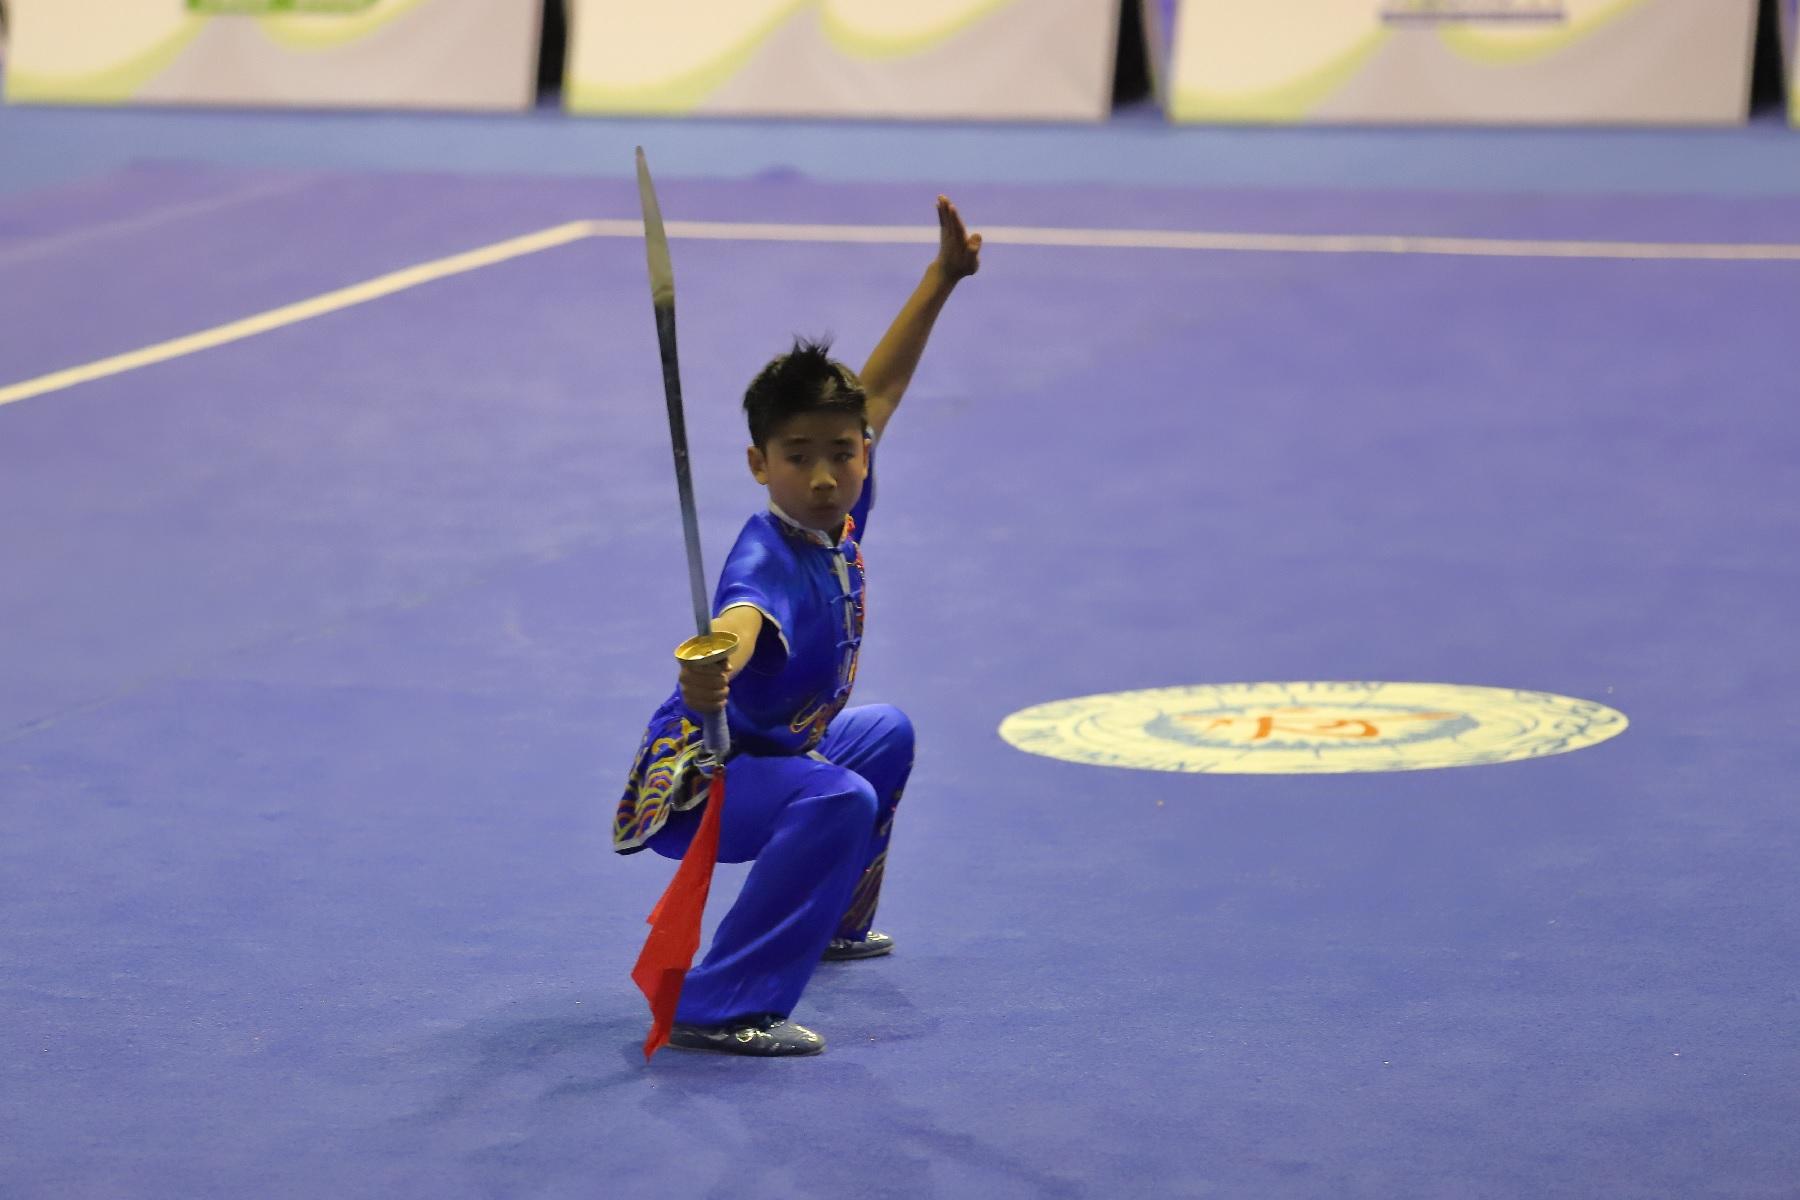 wayland-li-wushu-brazil-world-junior-wushu-championships-2018-team-canada-05.jpg